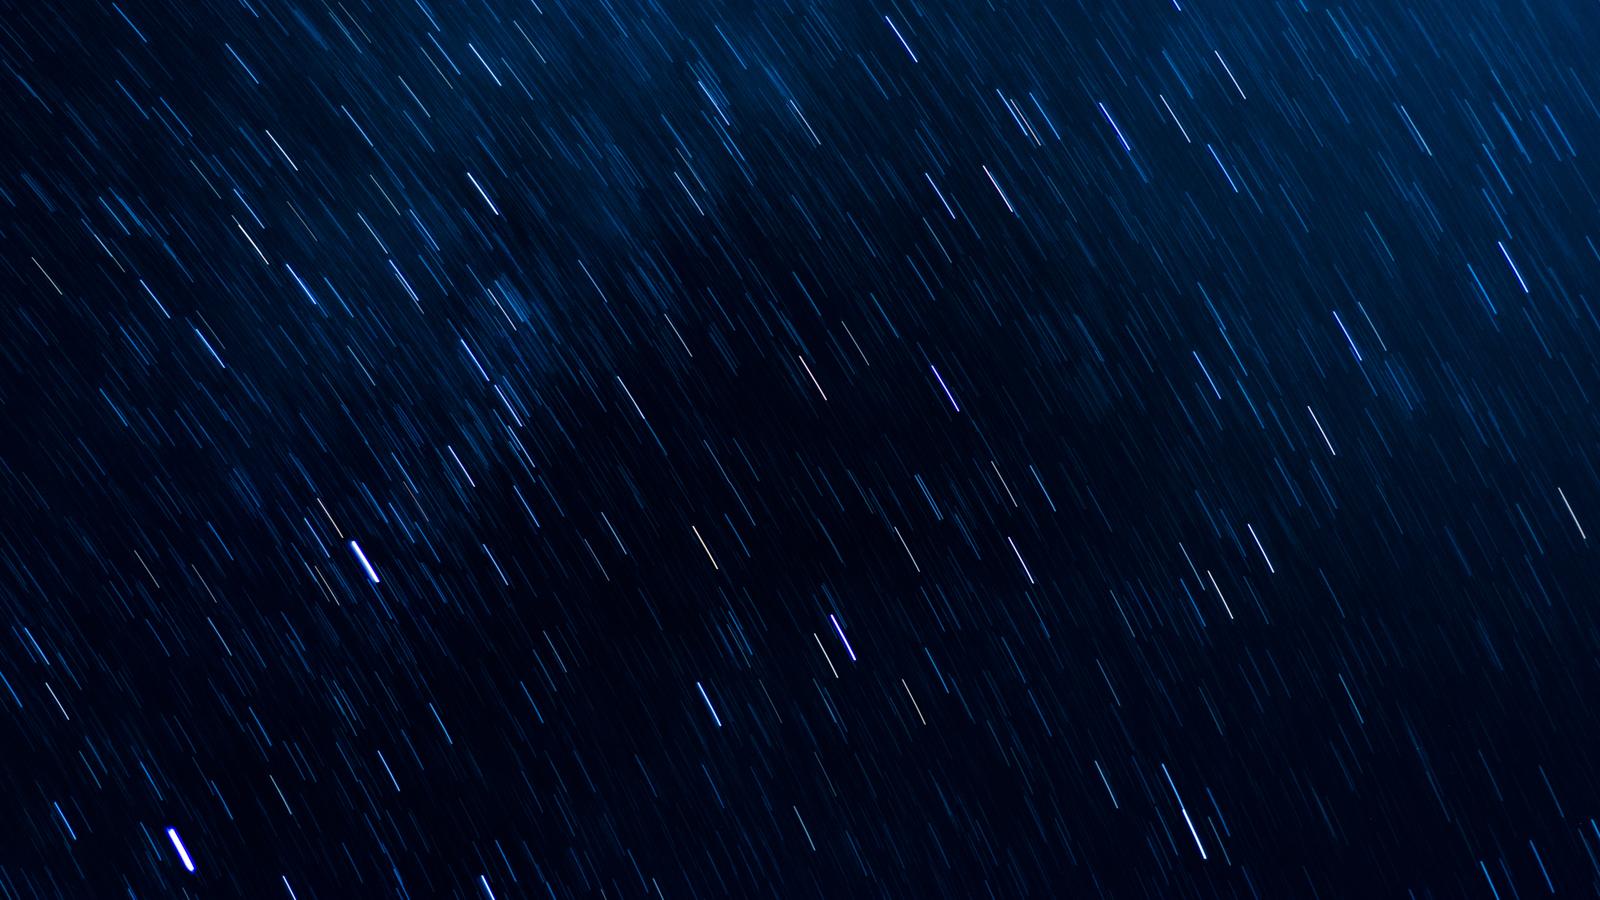 wallpaper: star trail 20letthecolorsrumble on deviantart